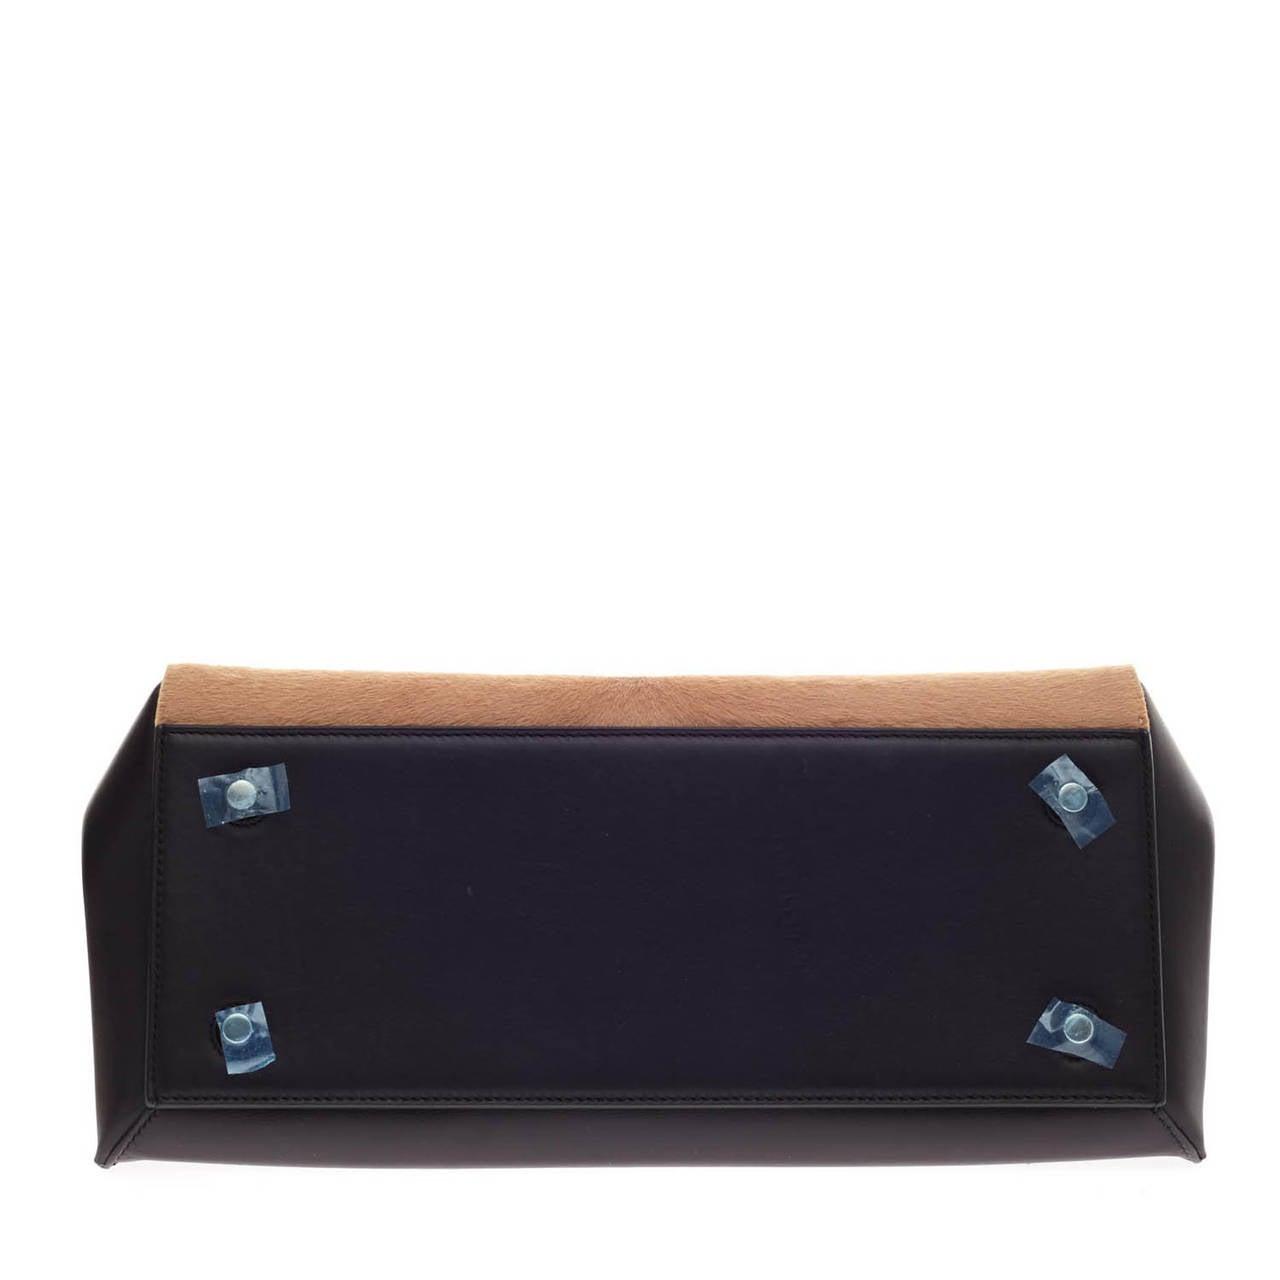 buy imitation handbags - celine black calfskin leather and blue pony hair medium edge ...